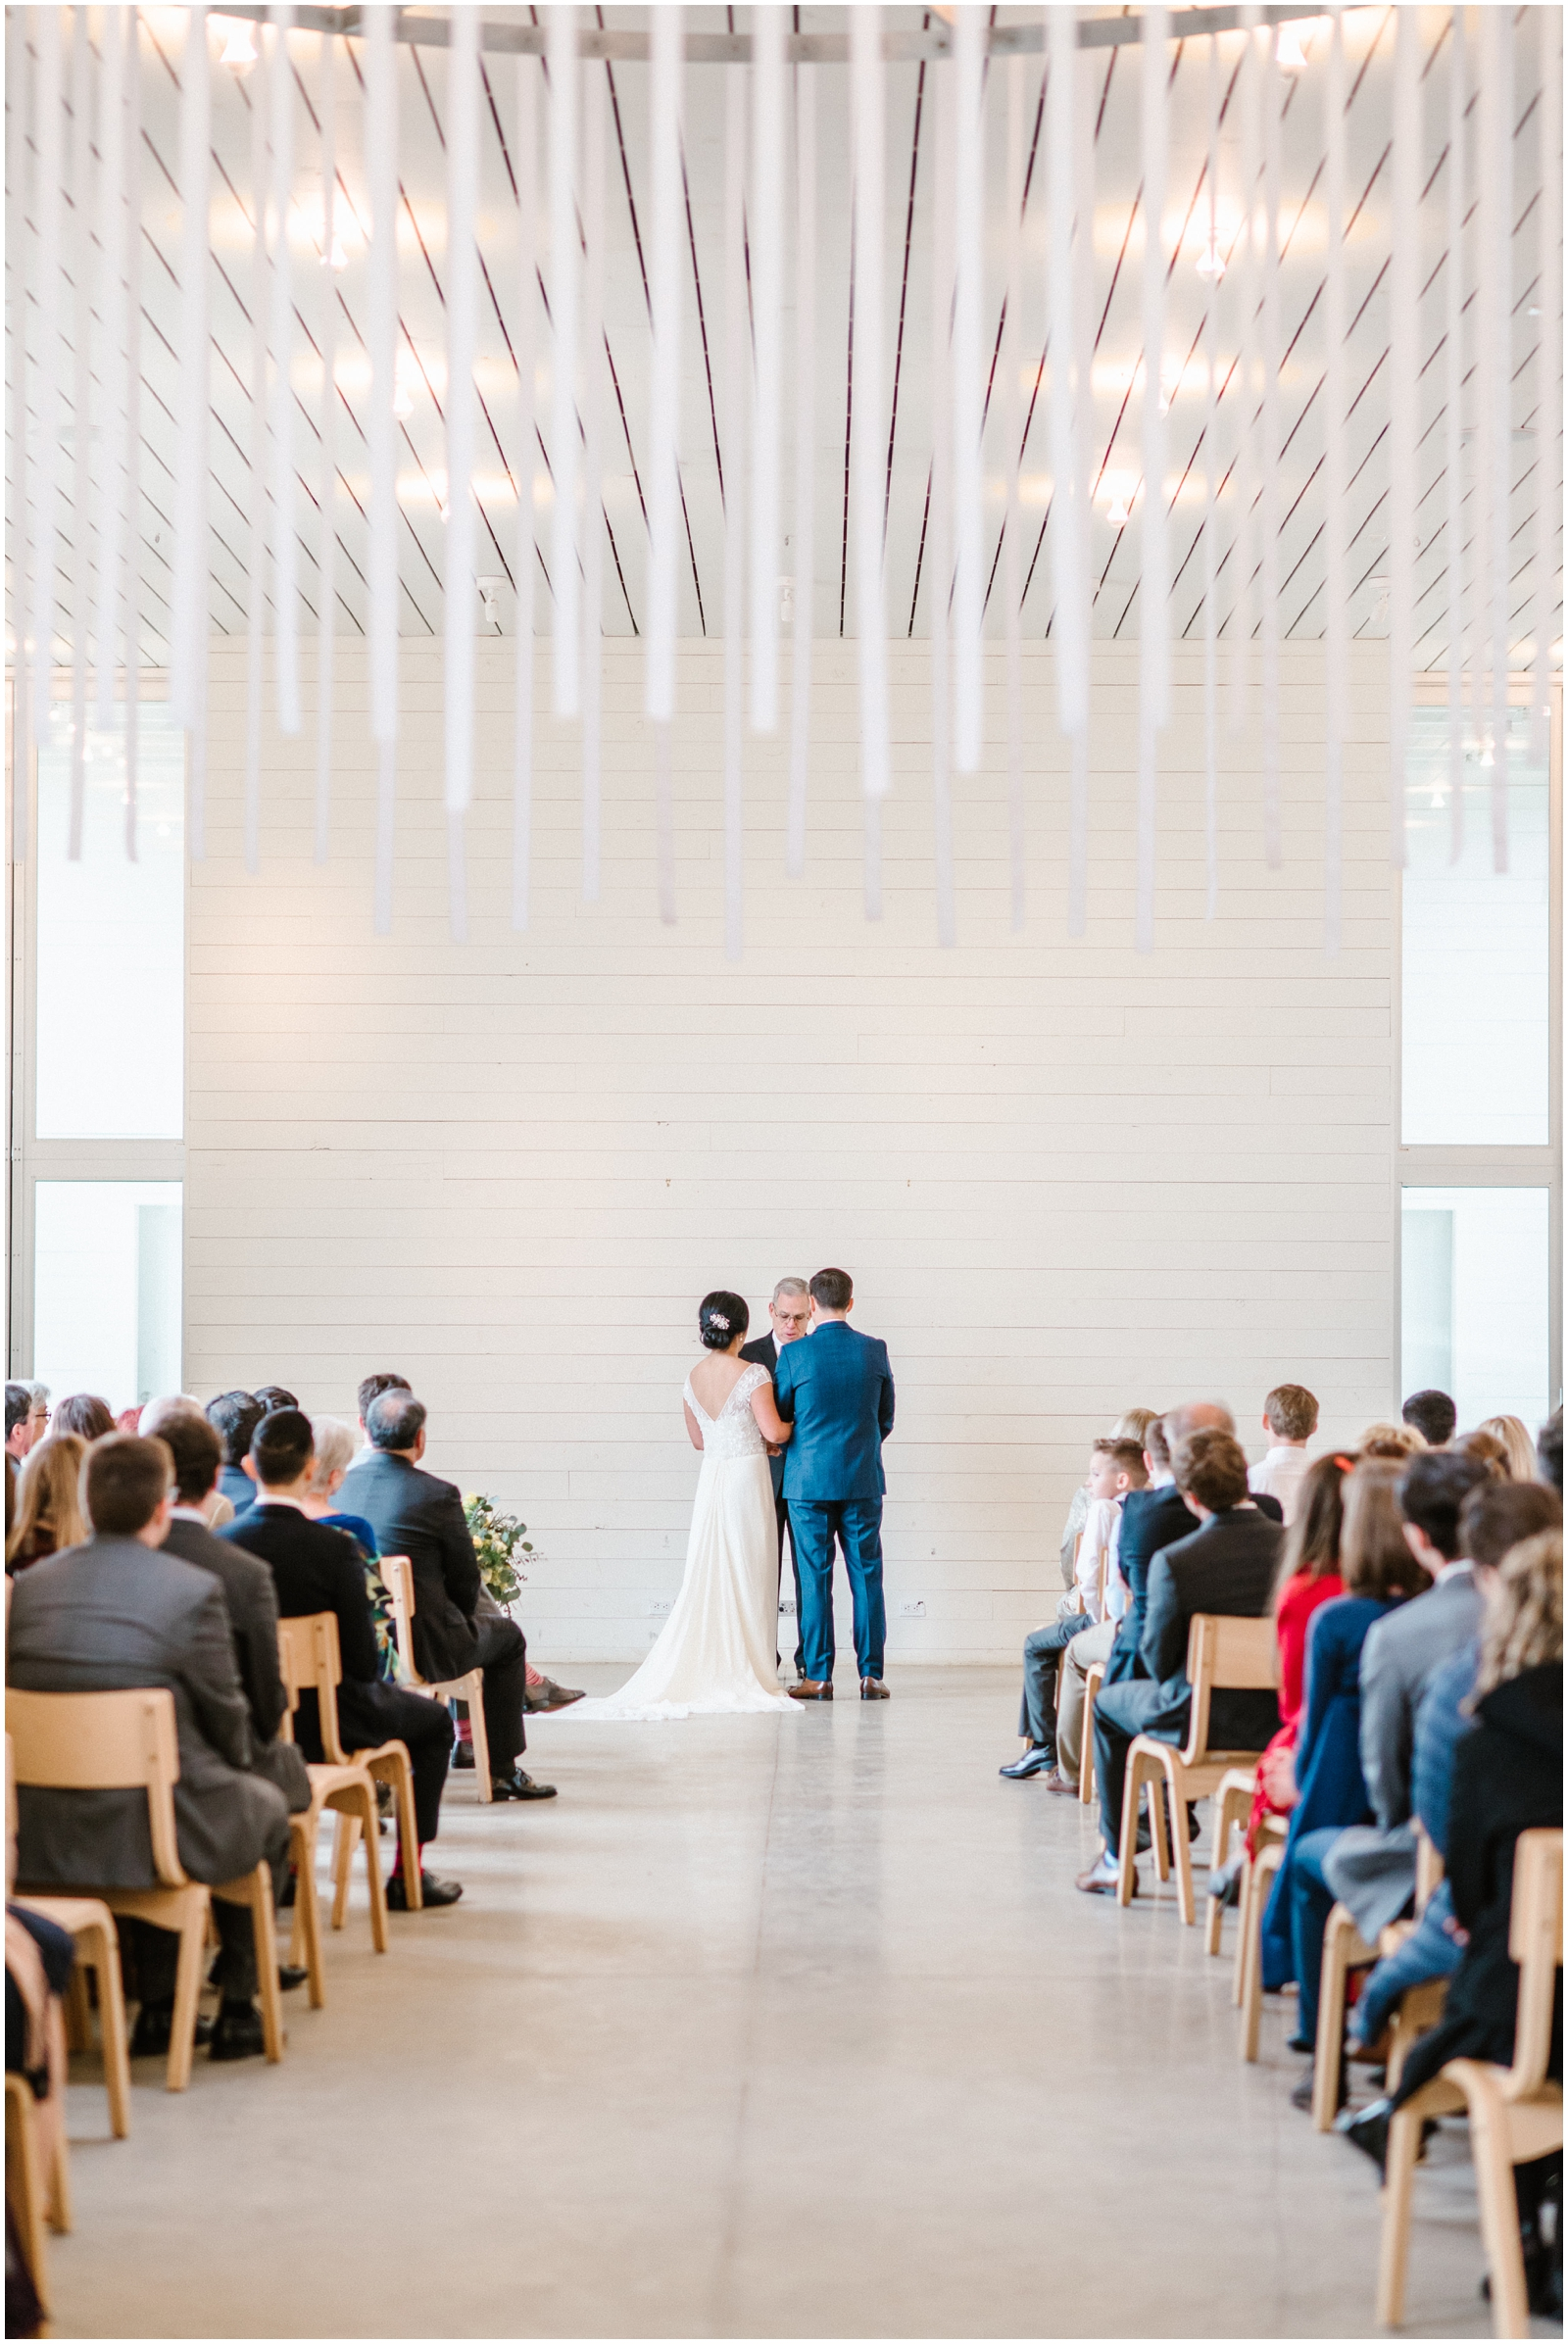 Minimalistic TX Venue Prosper House -Austin Wedding Planner_0342.jpg